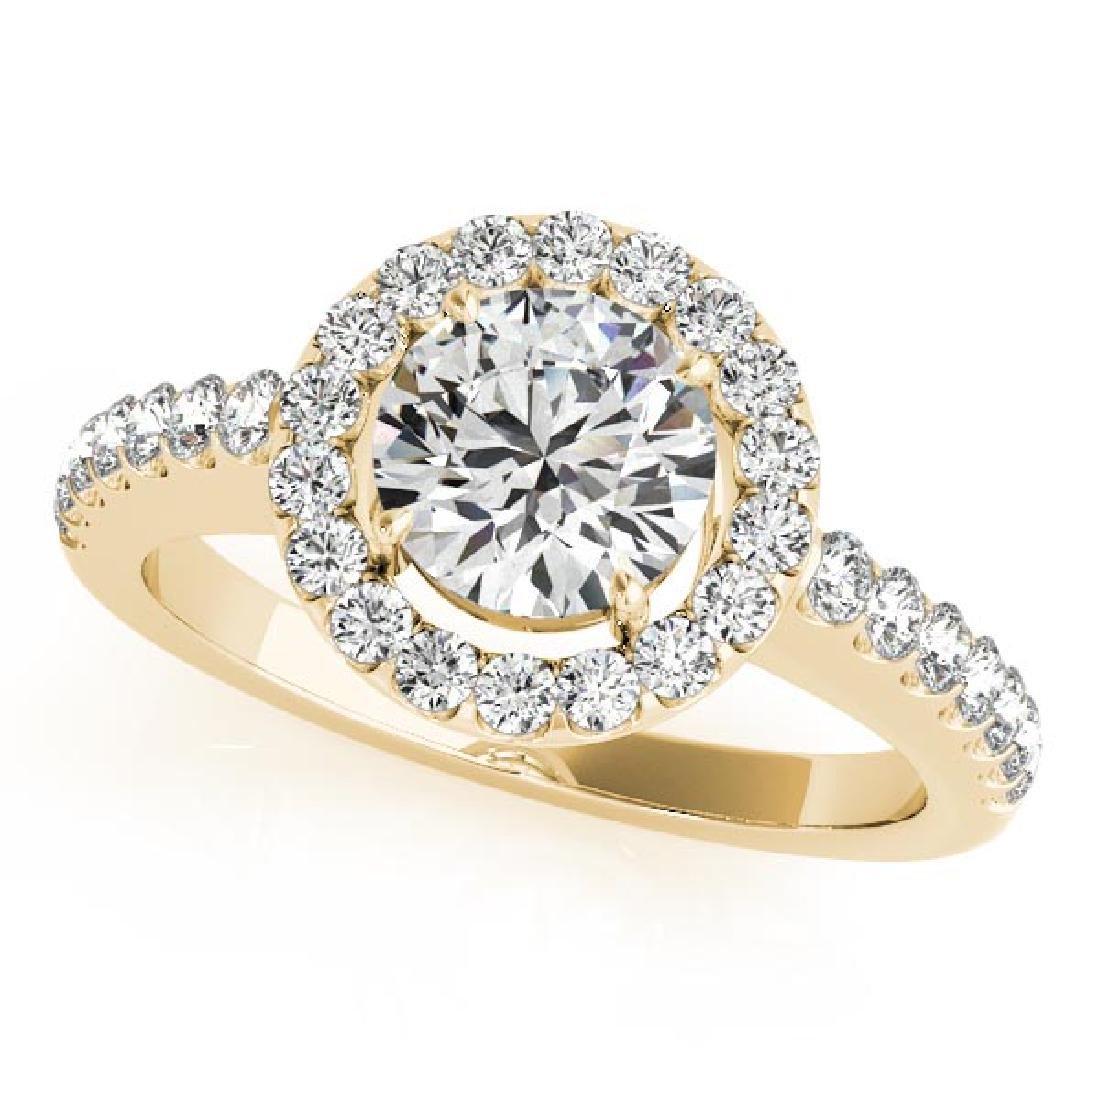 CERTIFIED 18K YELLOW GOLD 1.03 CT G-H/VS-SI1 DIAMOND HA